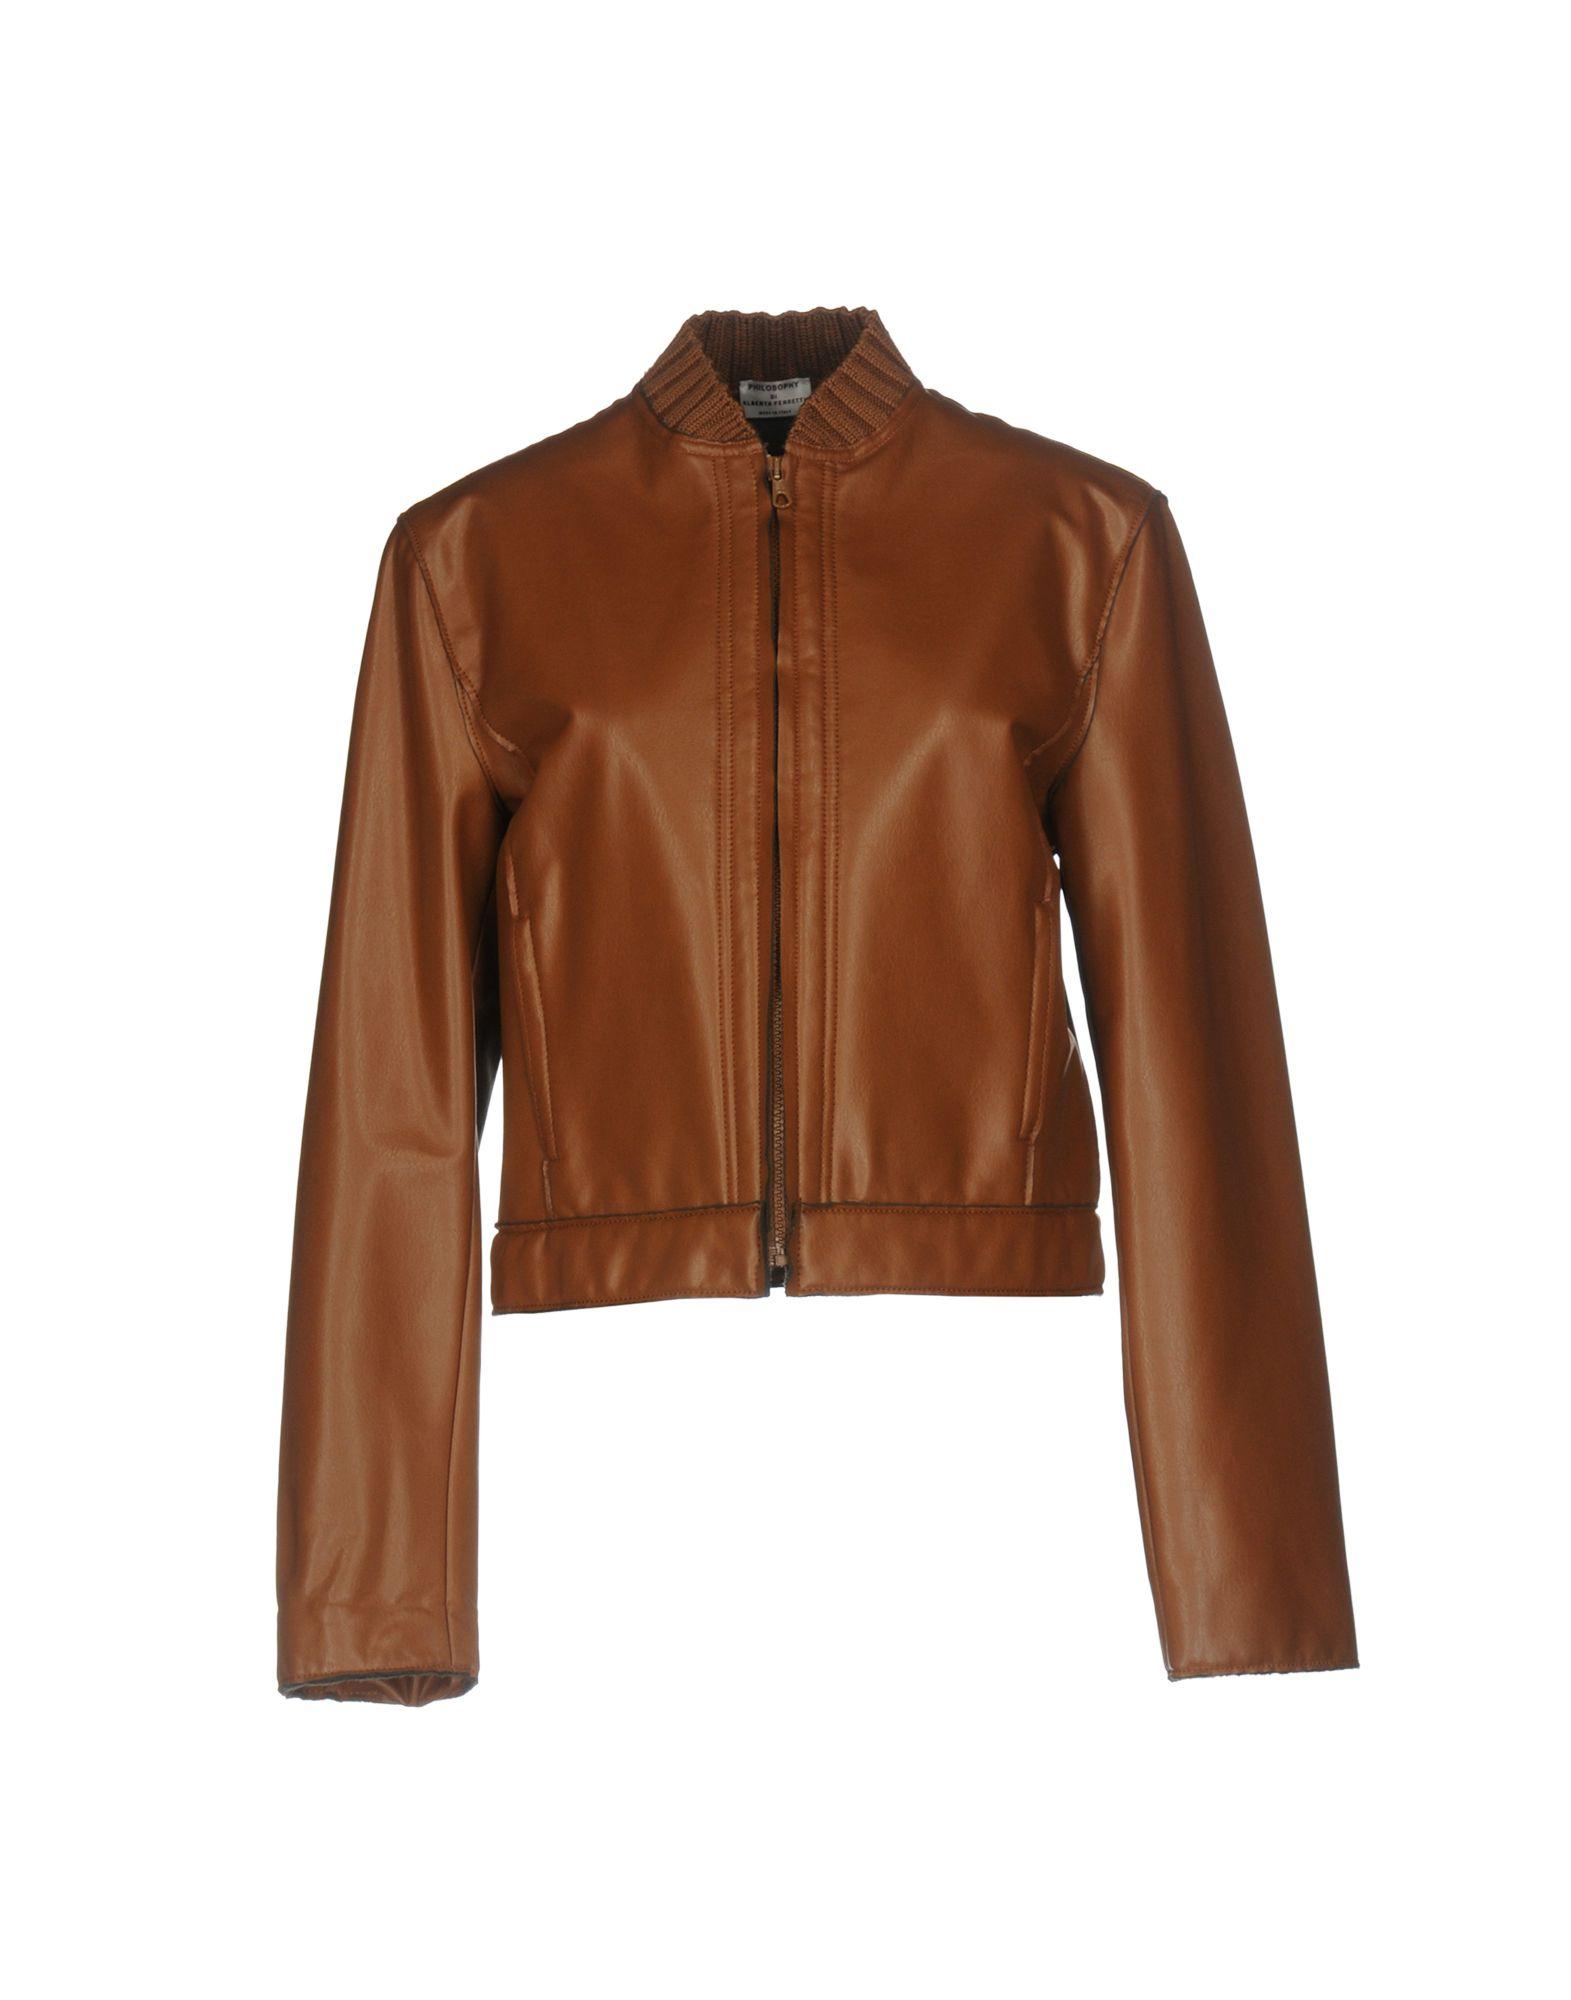 PHILOSOPHY di ALBERTA FERRETTI Damen Jacke Farbe Braun Größe 6